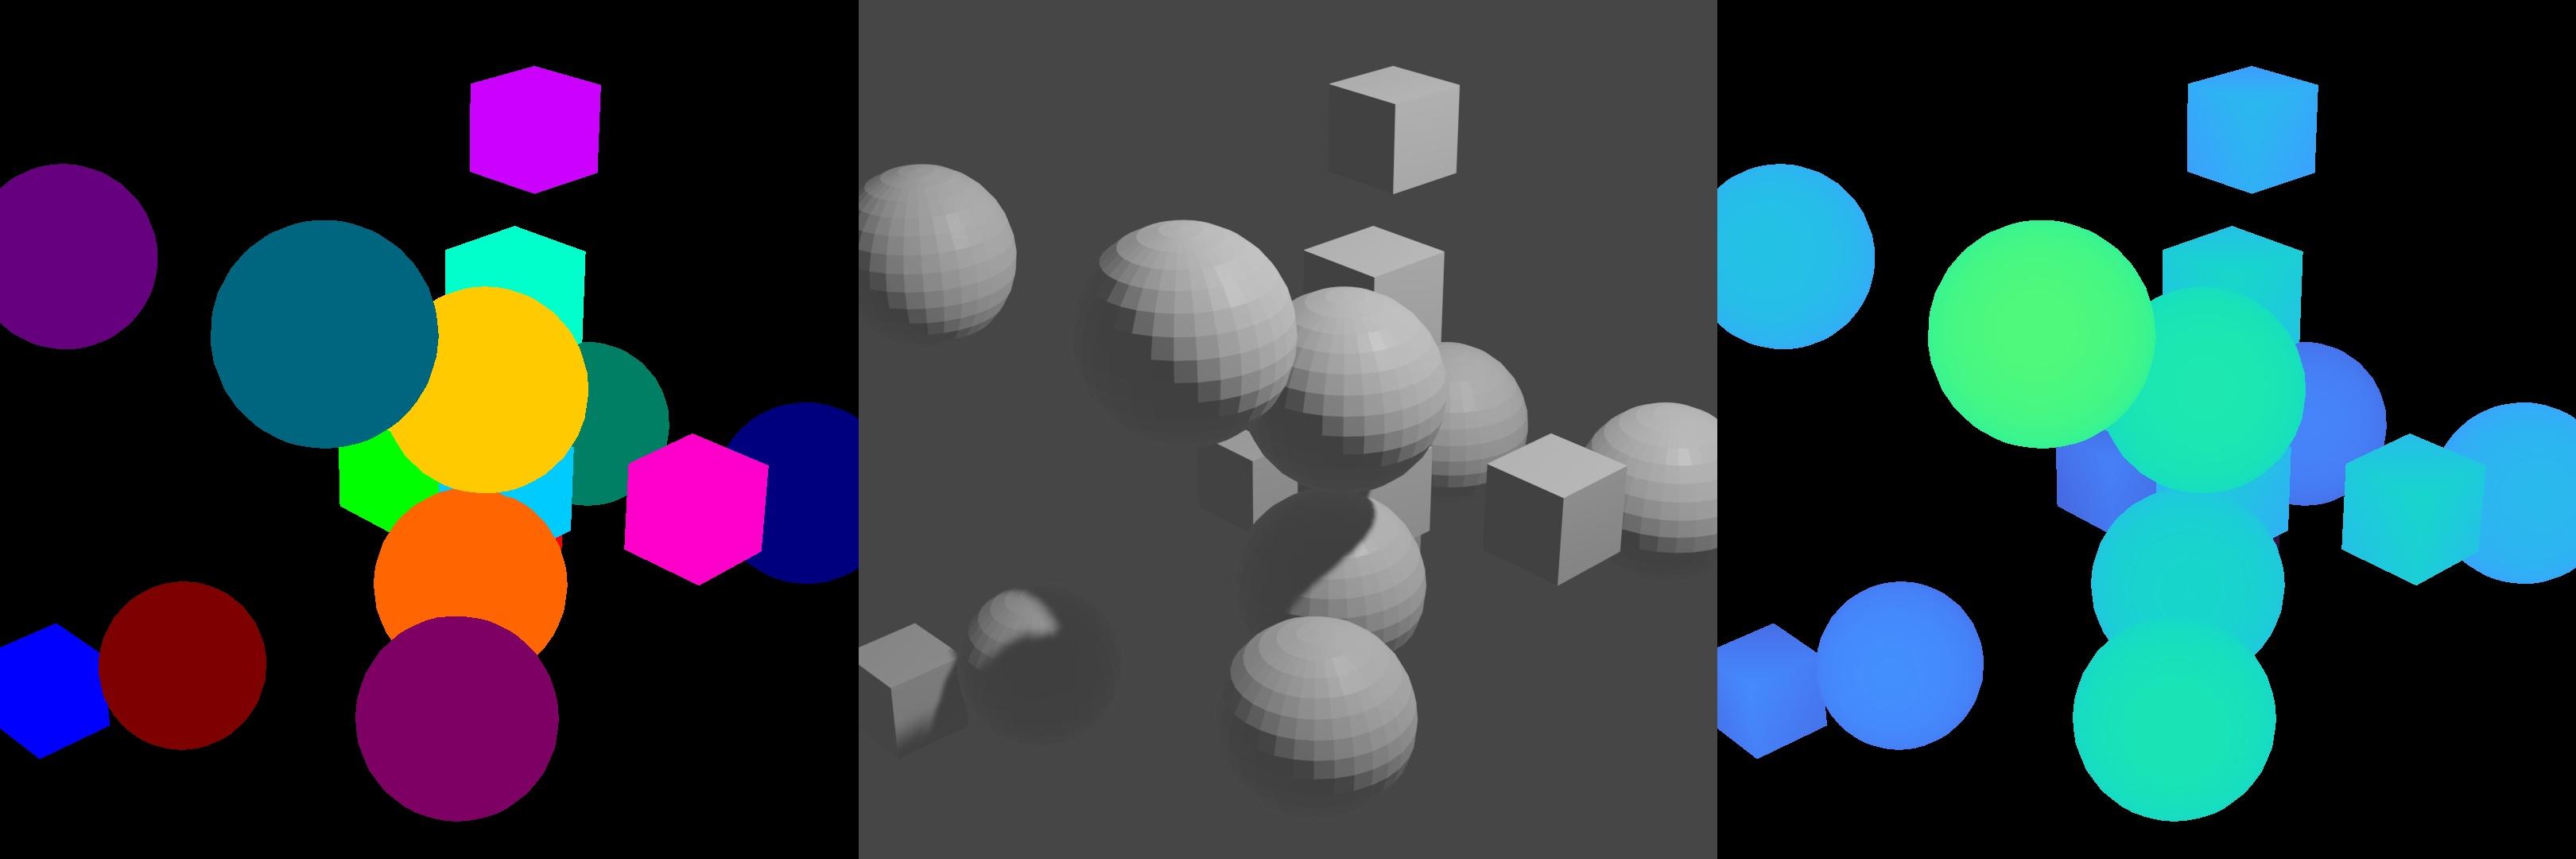 demo-vis(inst_rgb_depth)